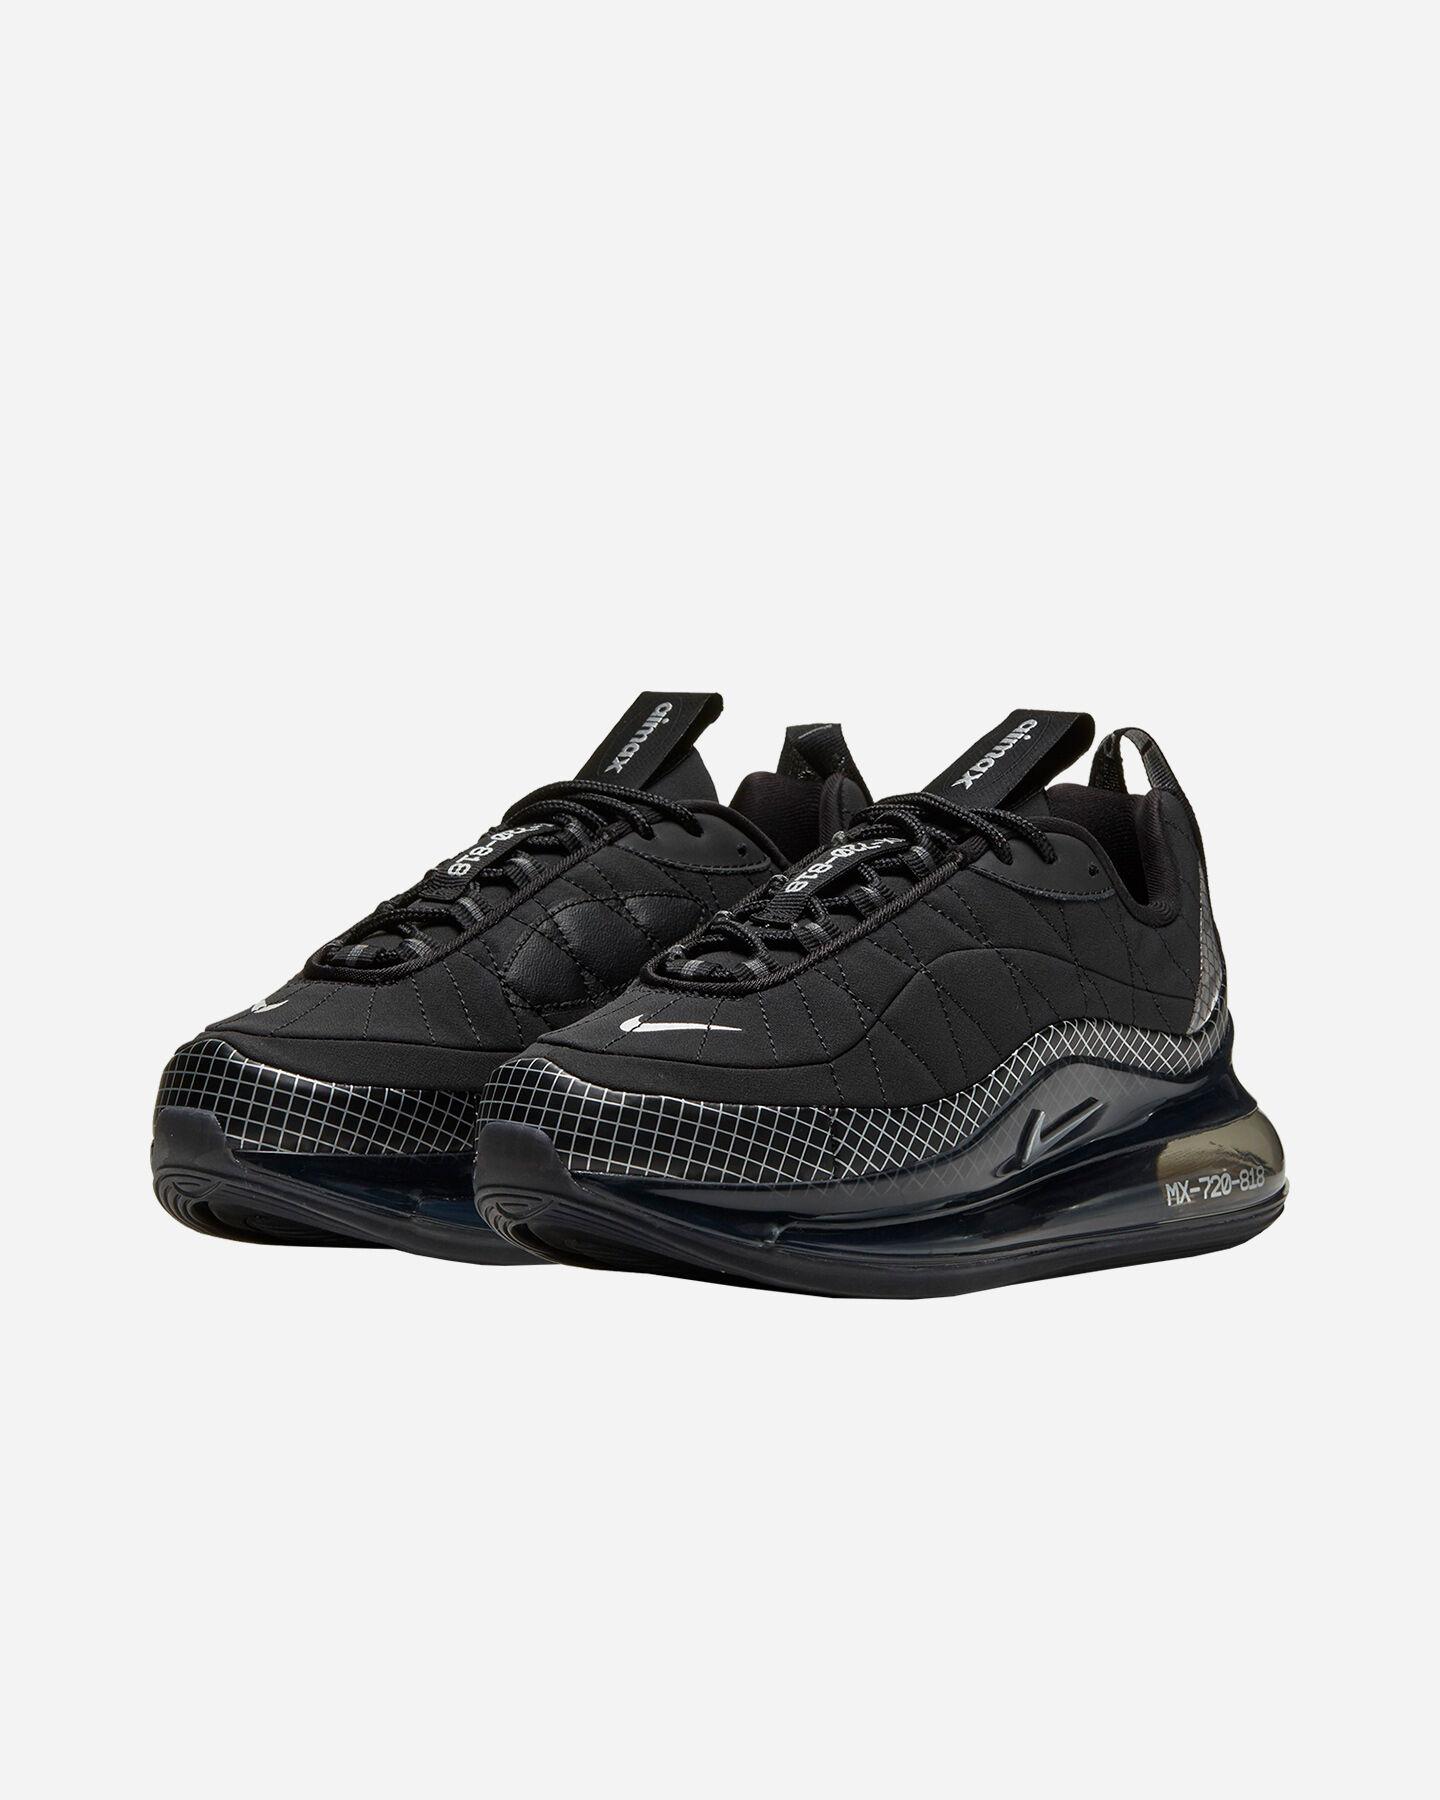 Scarpe sneakers NIKE MX-720-818 JR GS S5162020 scatto 1